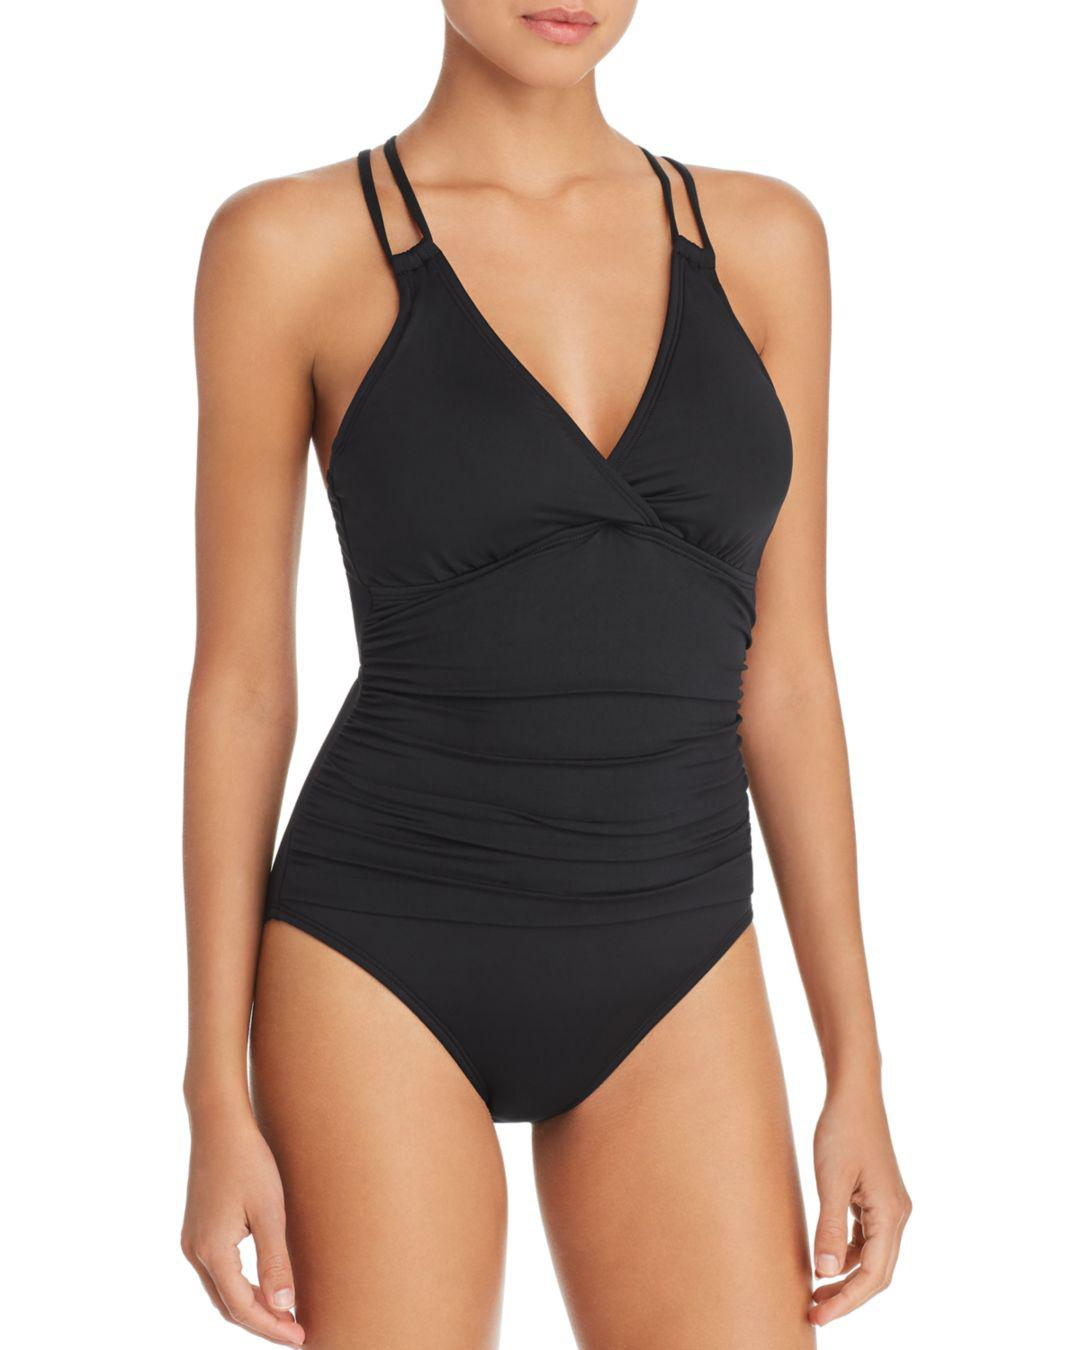 3fda4ff5115 La Blanca. Women's Black Island Goddess Underwire Tummy Control Cross-back  One-piece Swimsuit